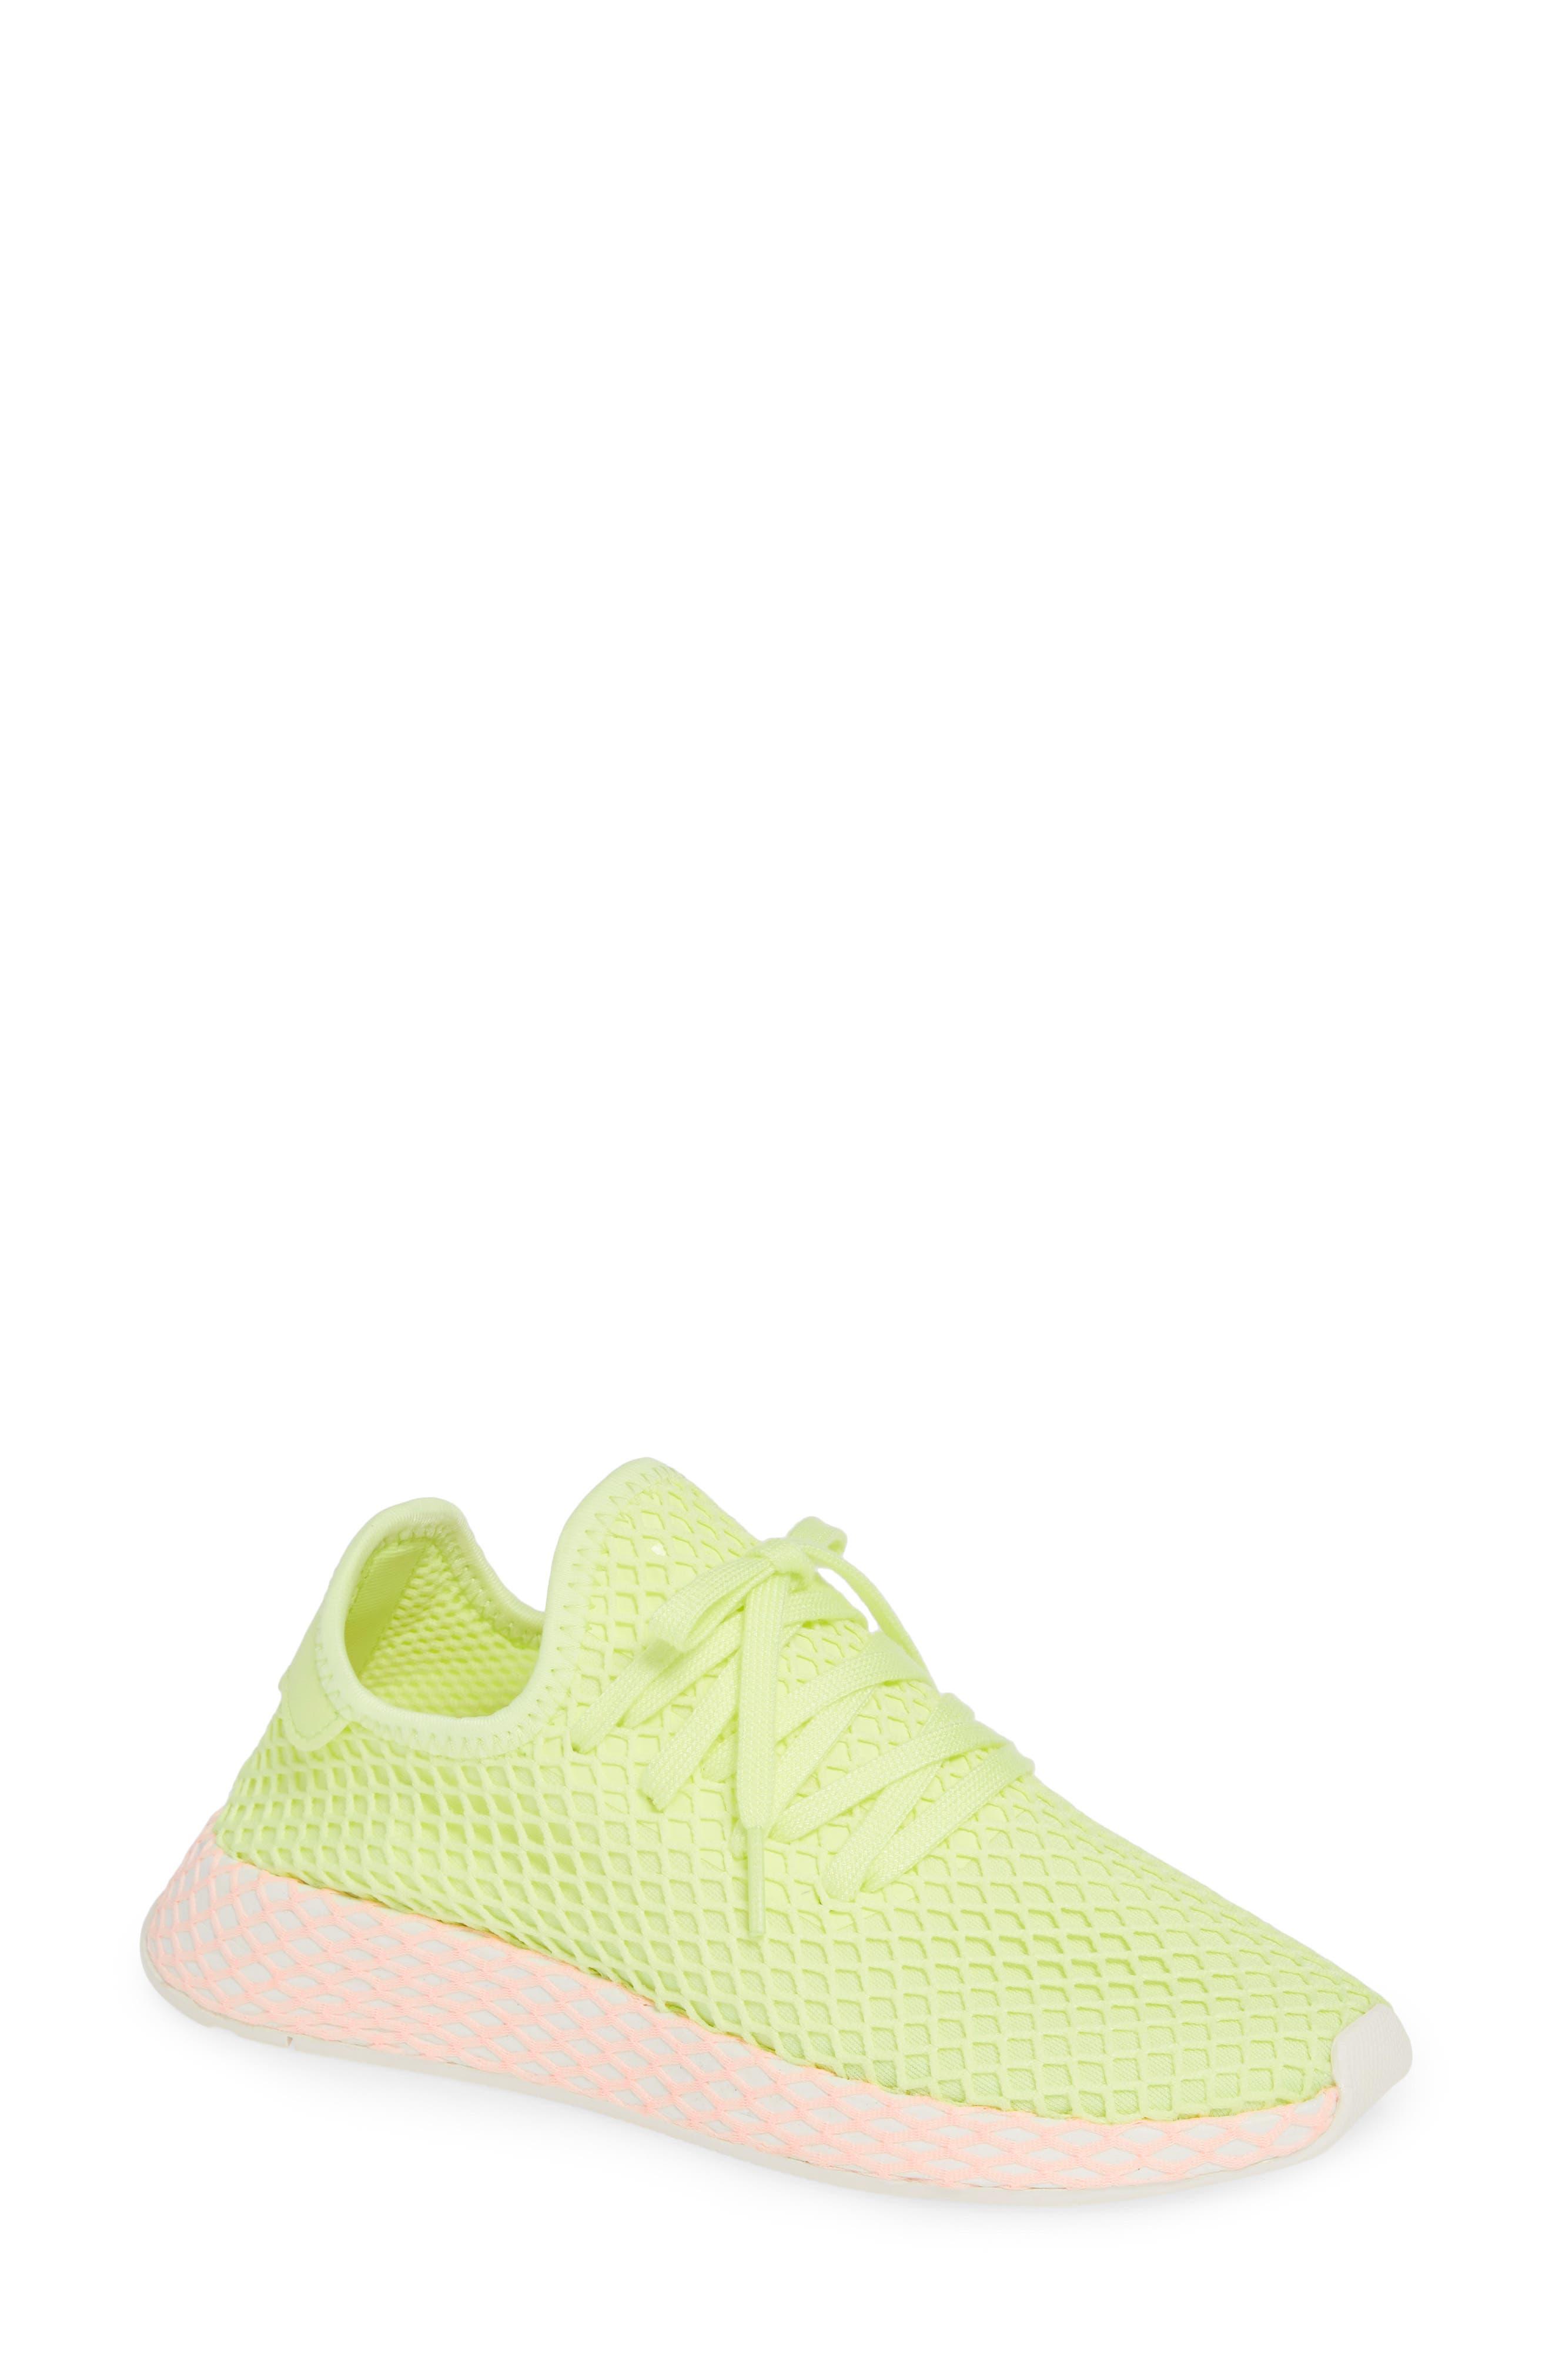 Deerupt Runner Sneaker,                         Main,                         color, GLOW/ GLOW/ CLEAR LILAC